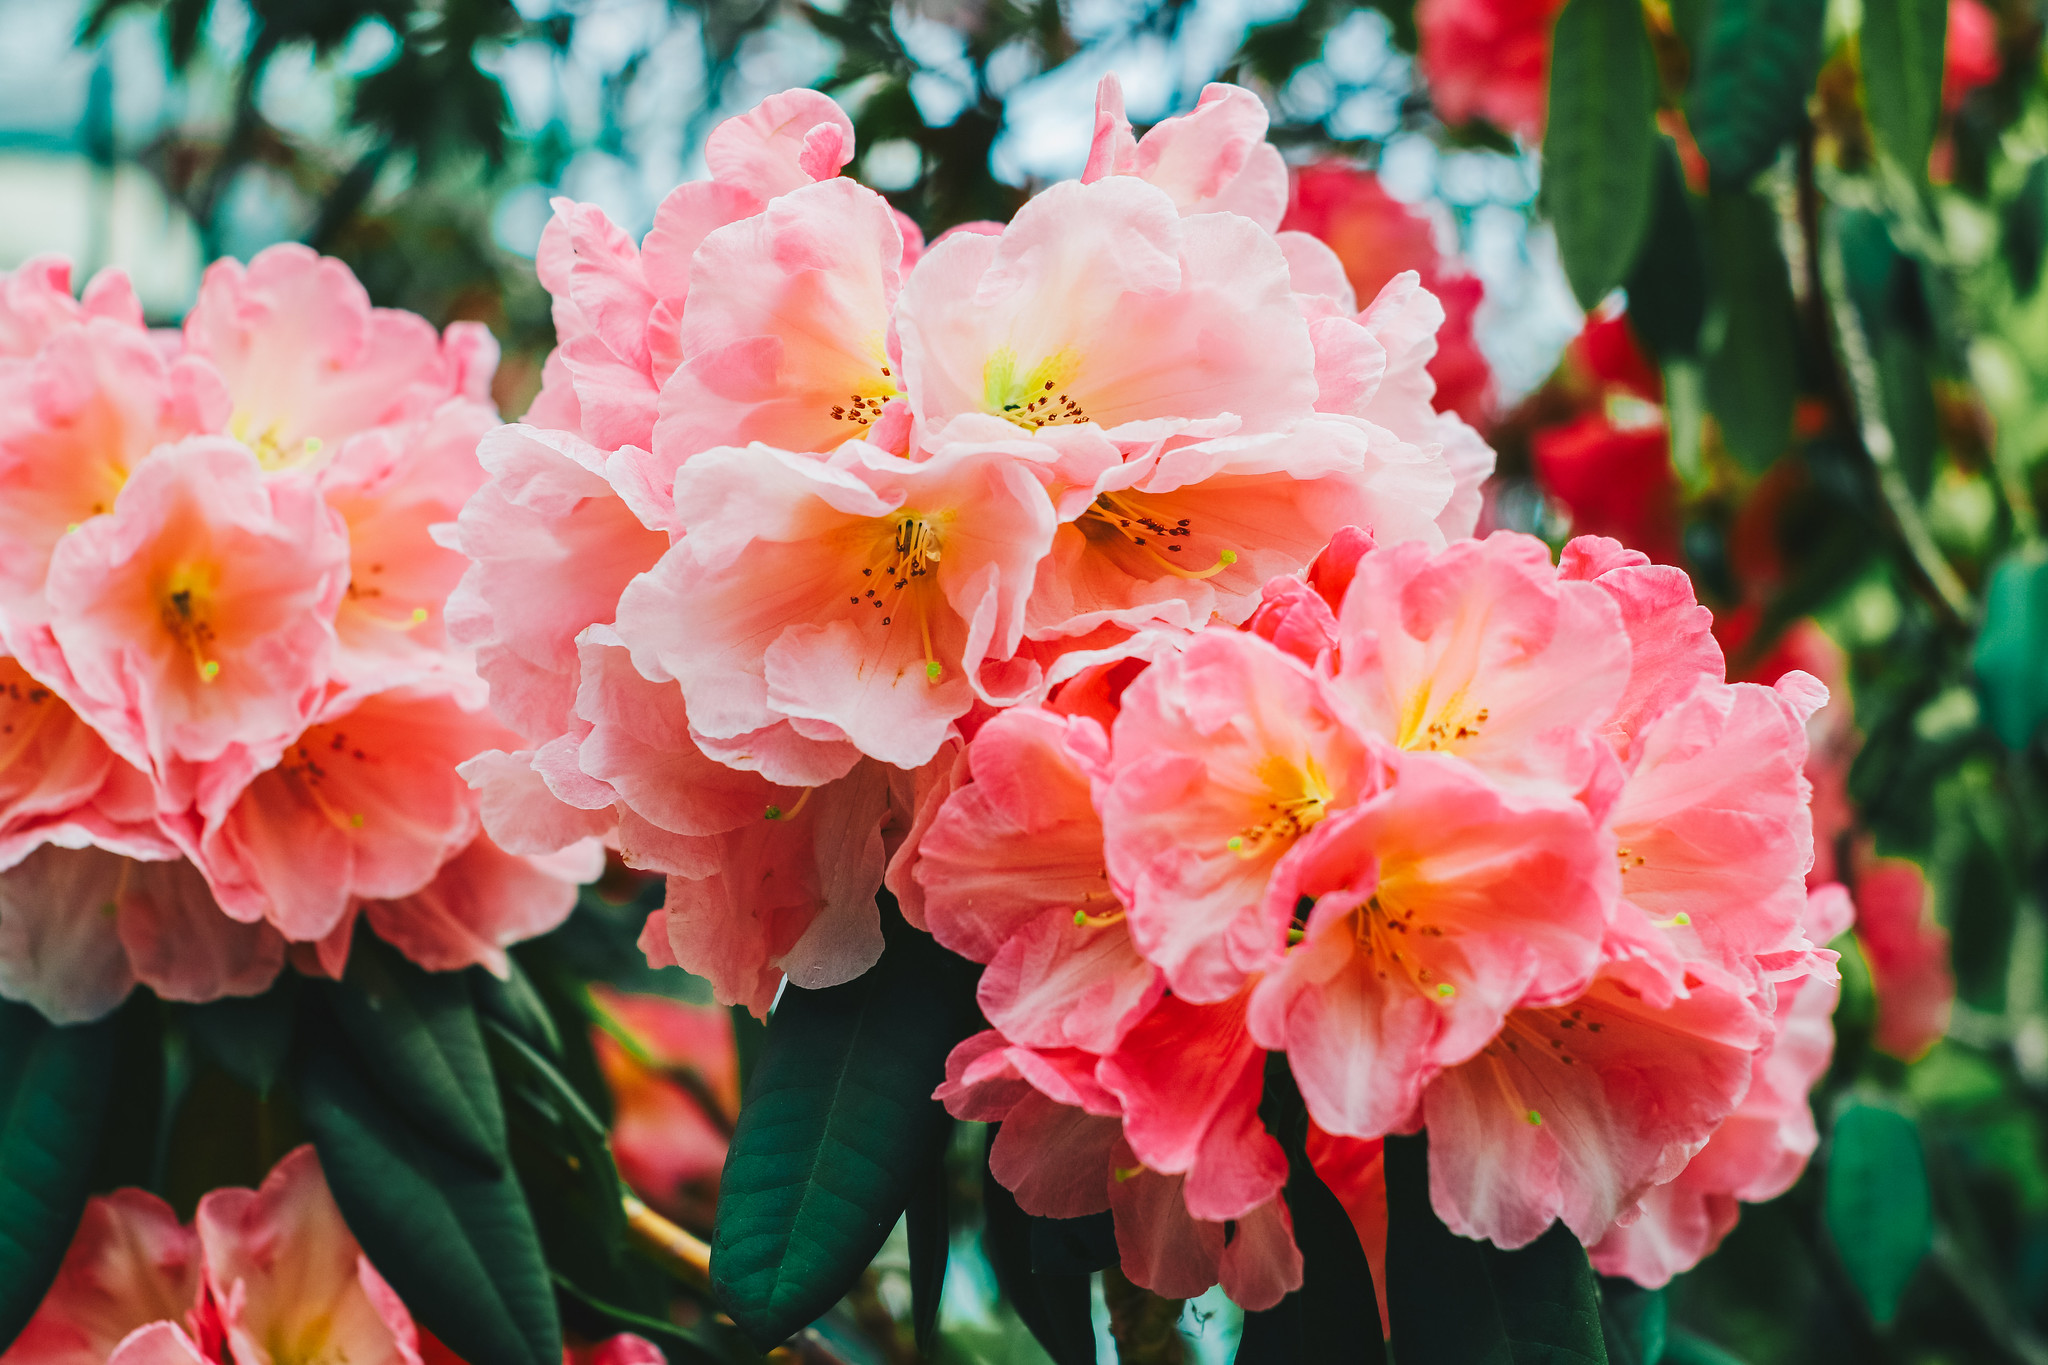 Rhododendron Mount Loma Prieta